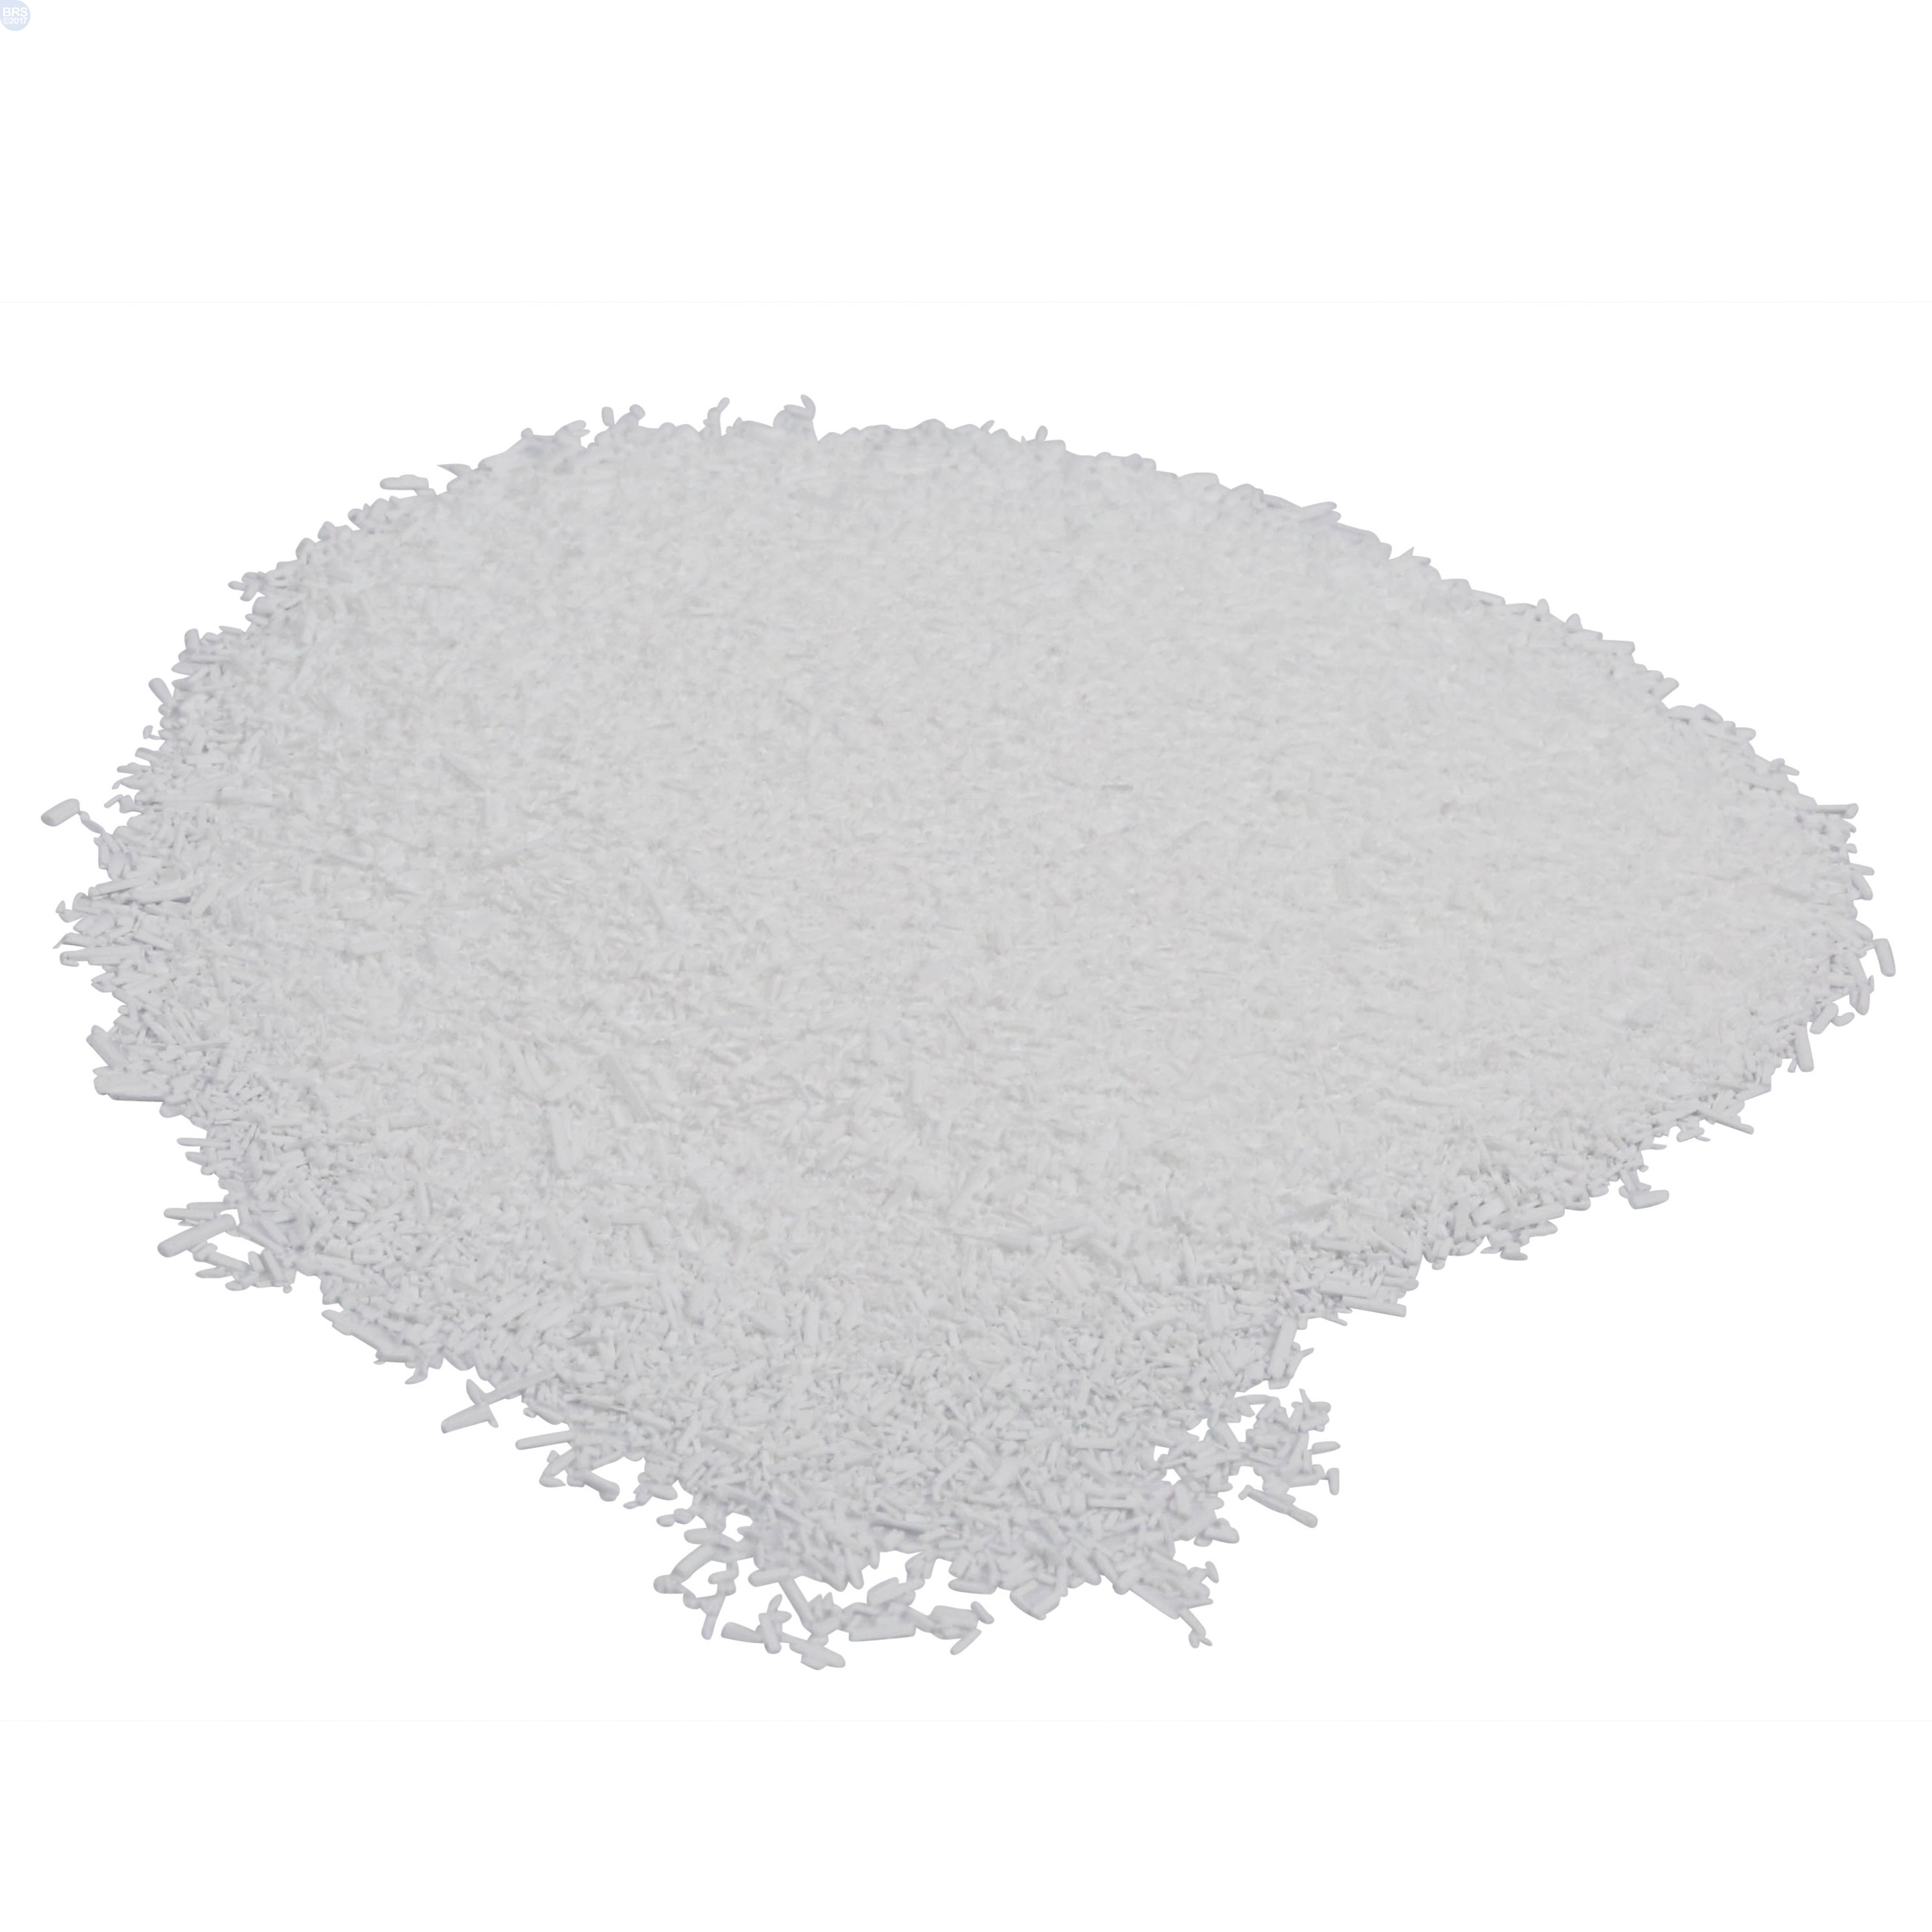 sodium carbonate na2co3 Iupac name: sodium carbonate other names: soda ash, washing soda cas:  497-19-8 chemical formula: na2co3 molar mass: 10598 g/mol.